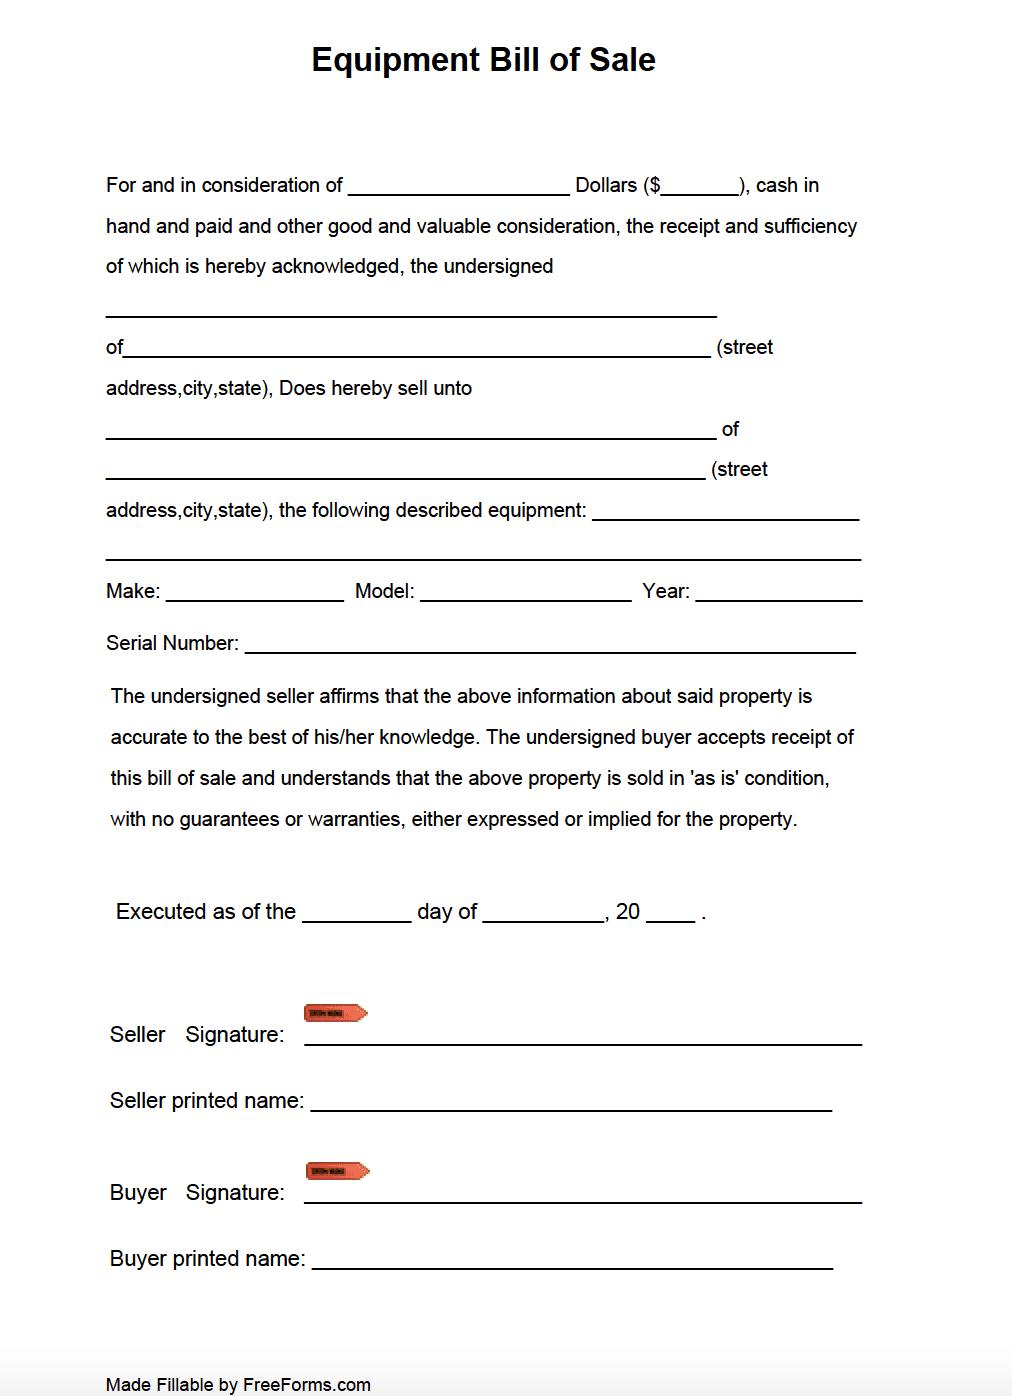 Free Equipment Bill of Sale Form   PDF